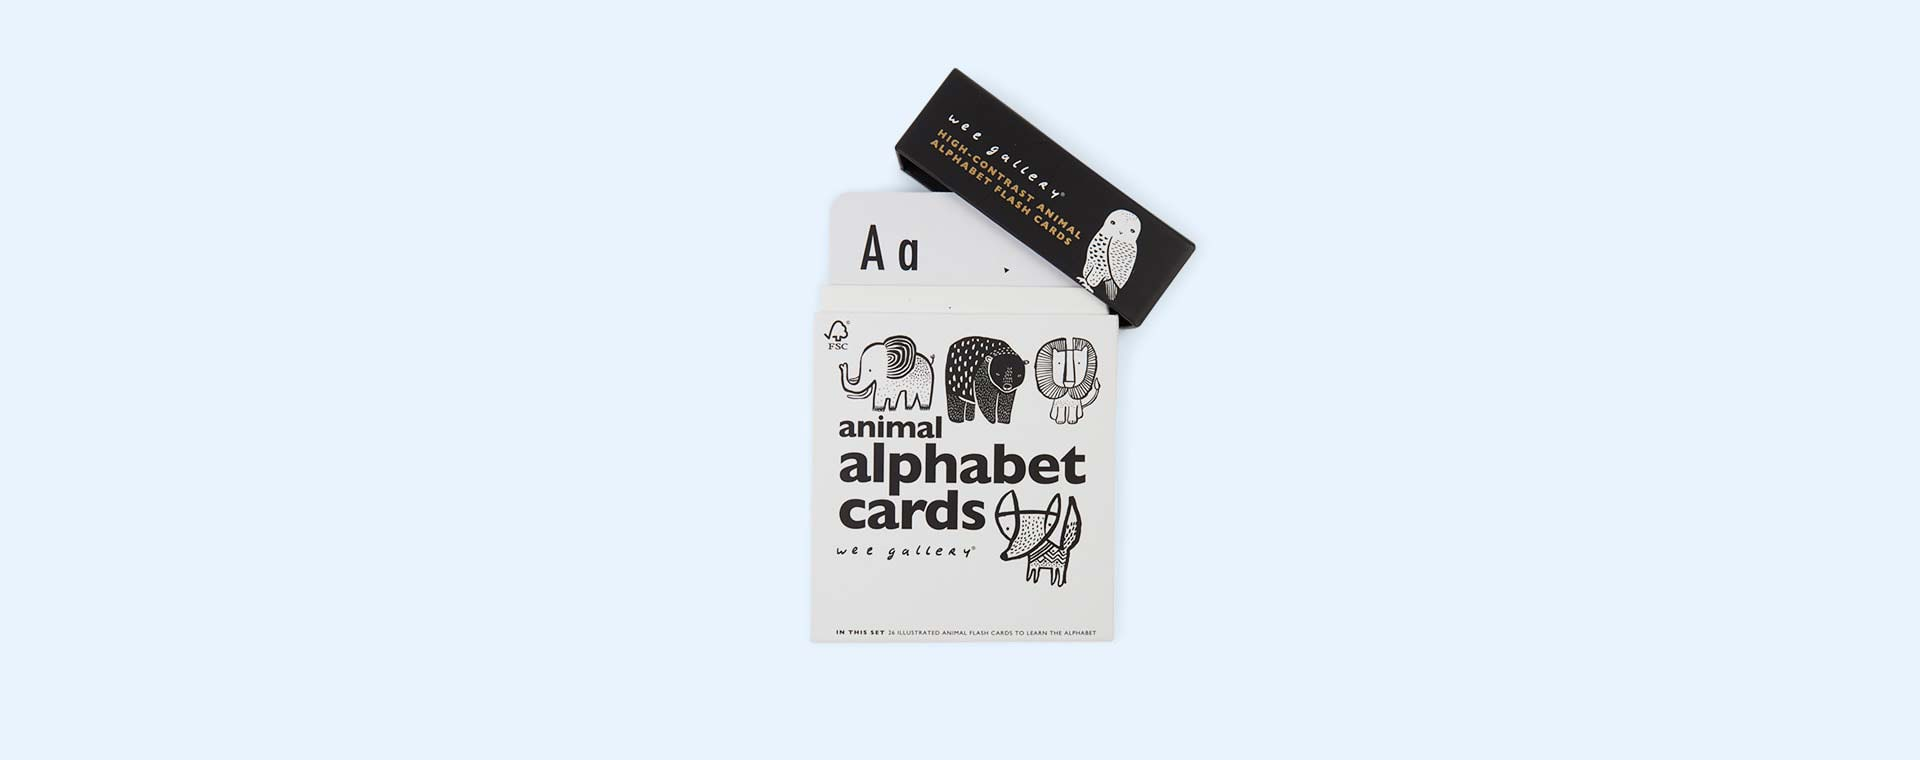 Animals Wee Gallery Animal Alphabet Cards